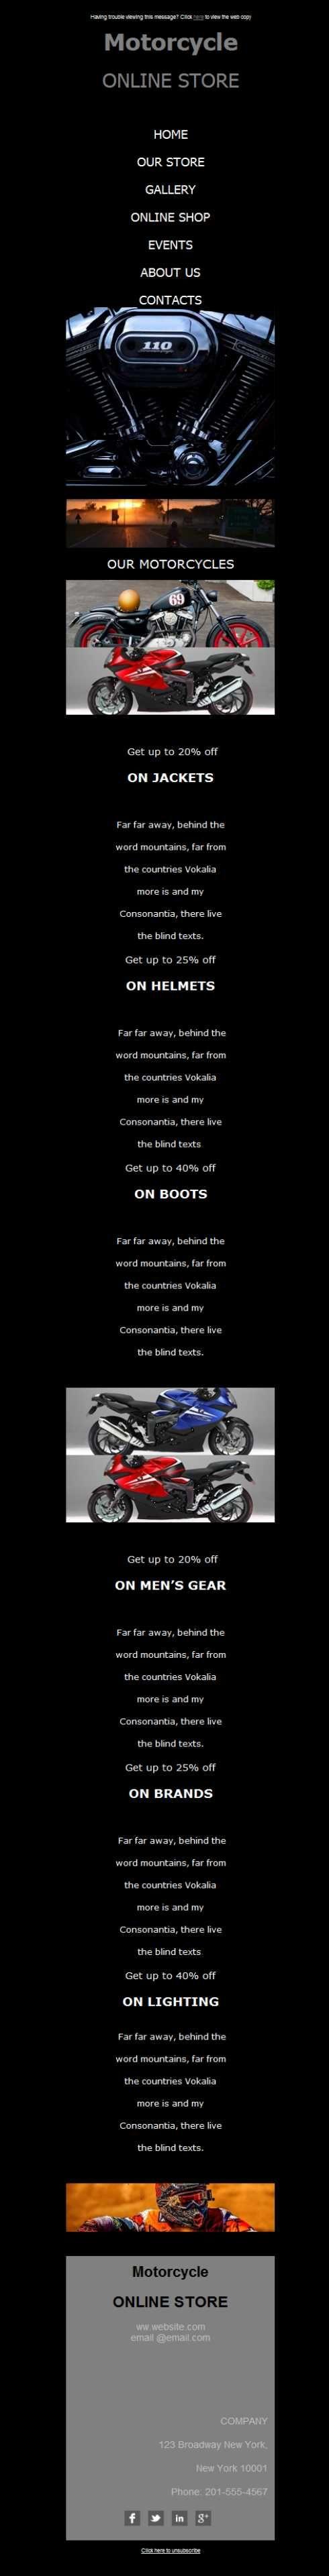 Para carreras, de montaña, urbanas... todo tipo de motocicletas en tu concesionario de motos. Y todo tipo de plantillas newsletter pensadas para cautivar a tus clientes. Sobre todo con este diseño responsive adaptado.